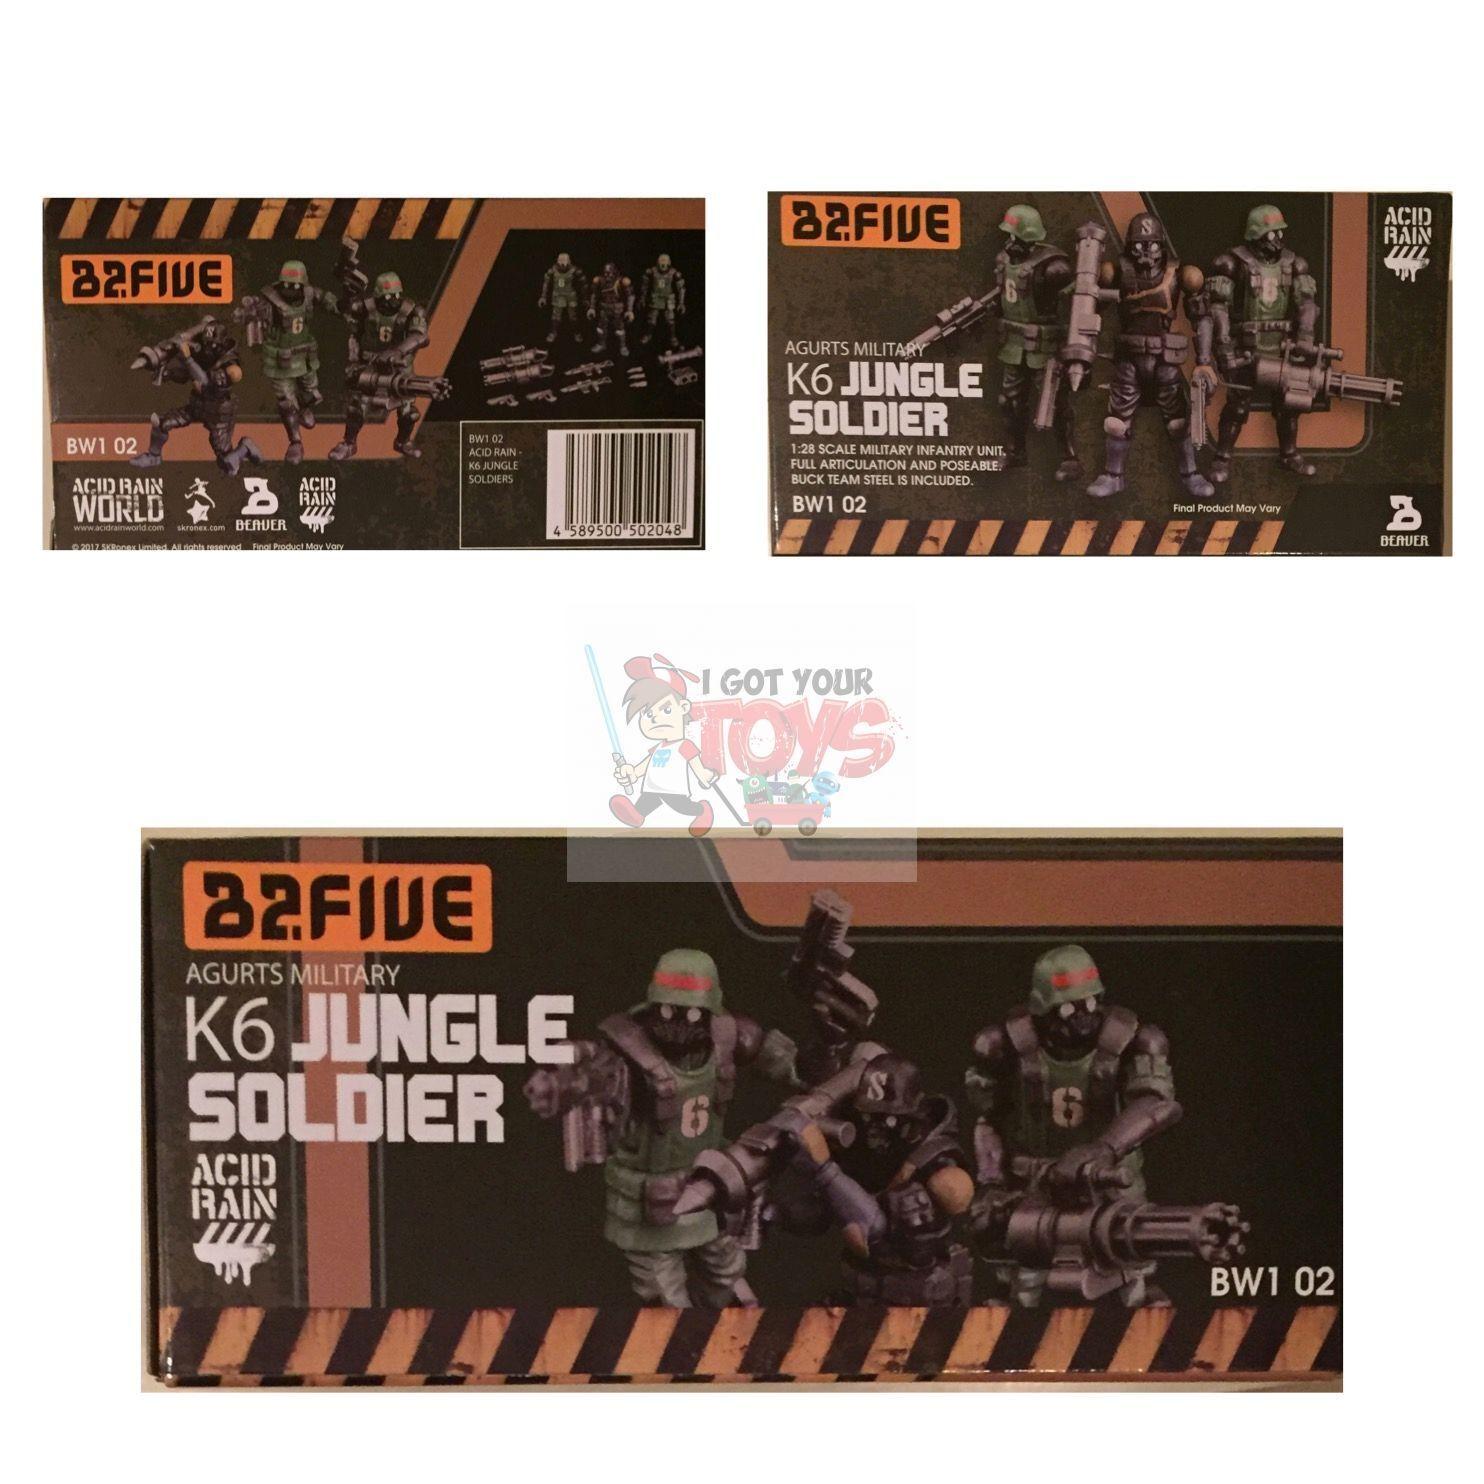 K6 JUNGLE SOLDIER SET (AGURTS MILITARY) Ori Toy ACID RAIN 2.5  Inch FIGURES 1 28